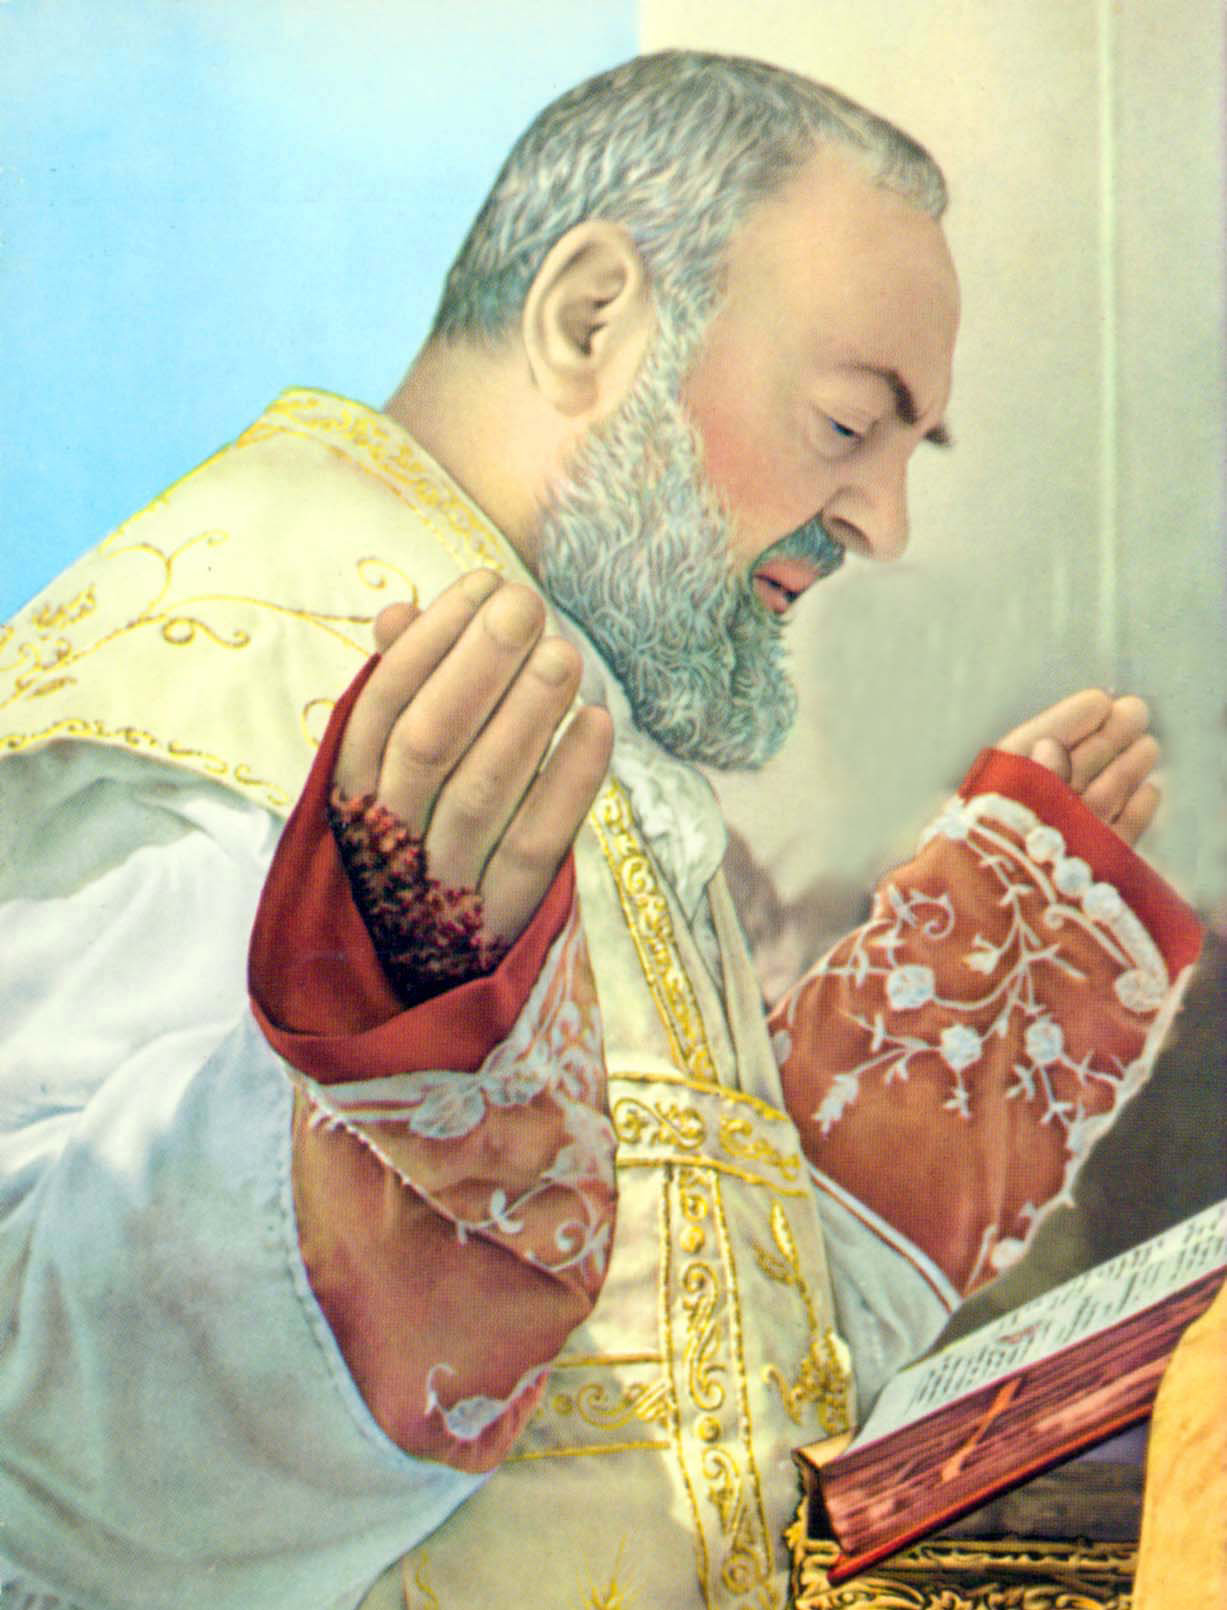 "<a href=""https://www.palmarianchurch.org/saint-pio-of-pietrelcina/"" title=""Sfîntul Pio din Pietrelcina"">Sfîntul Pio din Pietrelcina<br><br>Vedeți mai departe</a>"